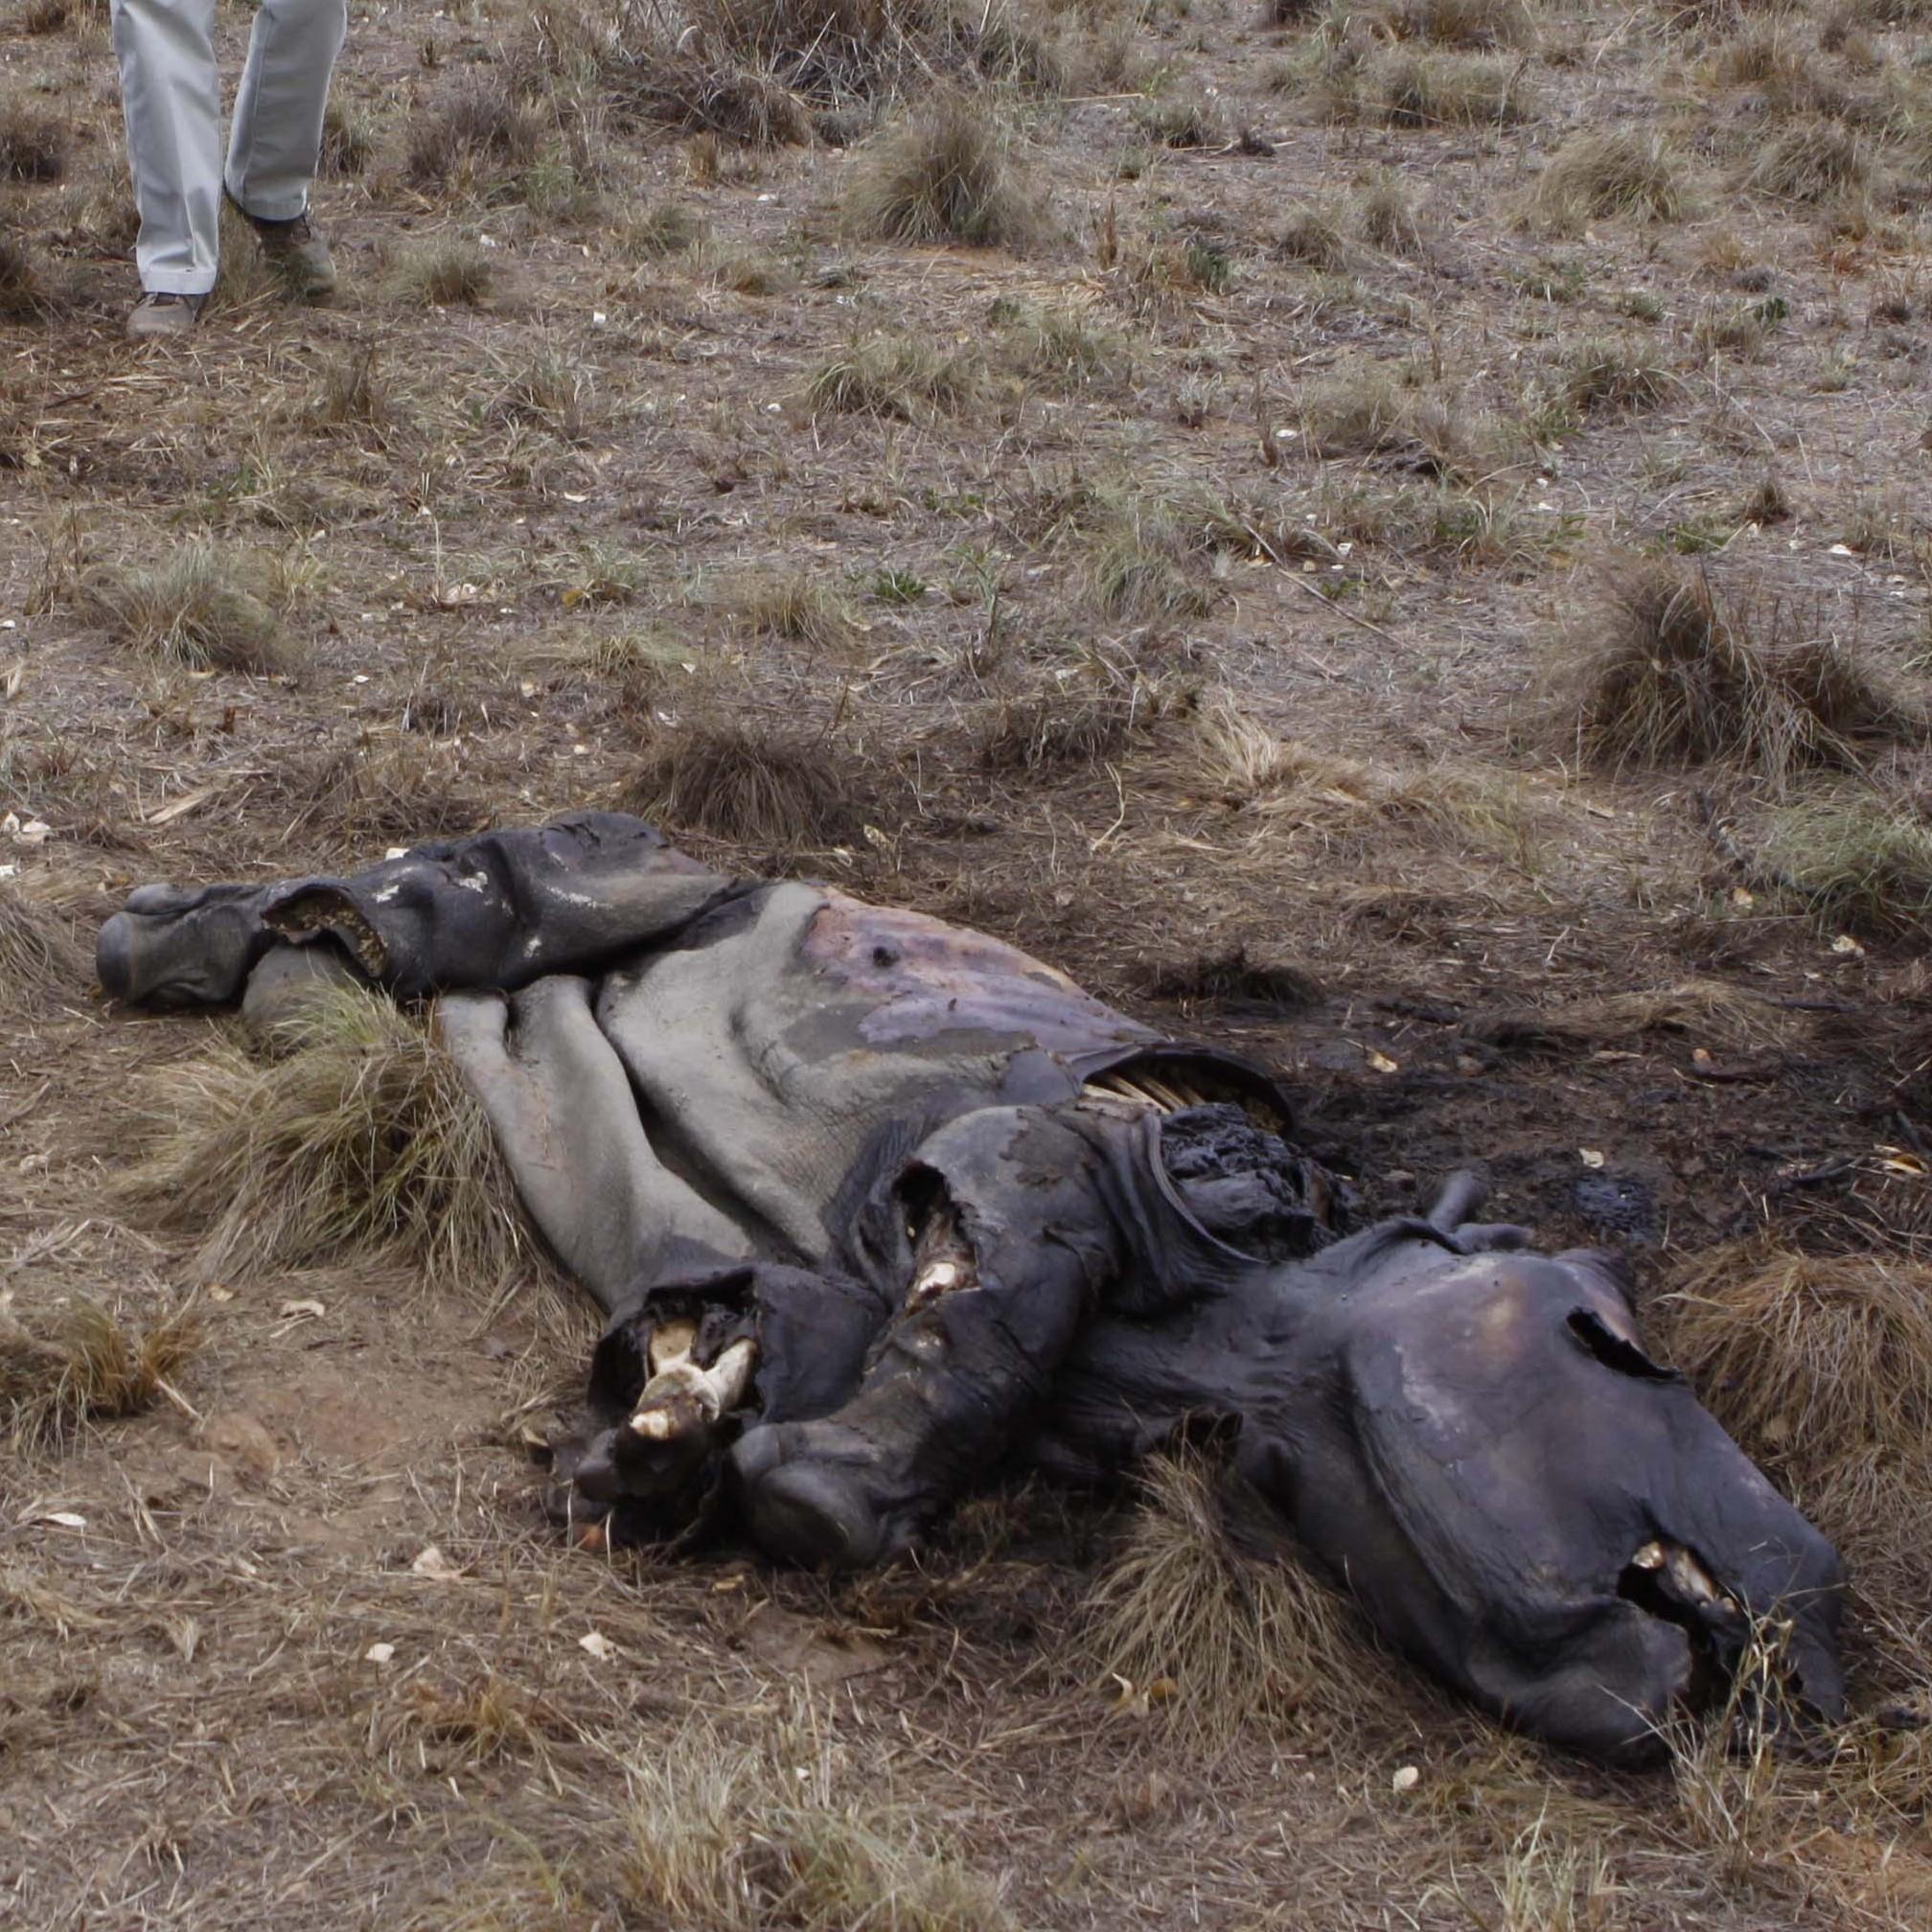 Elephant Poaching Weapons